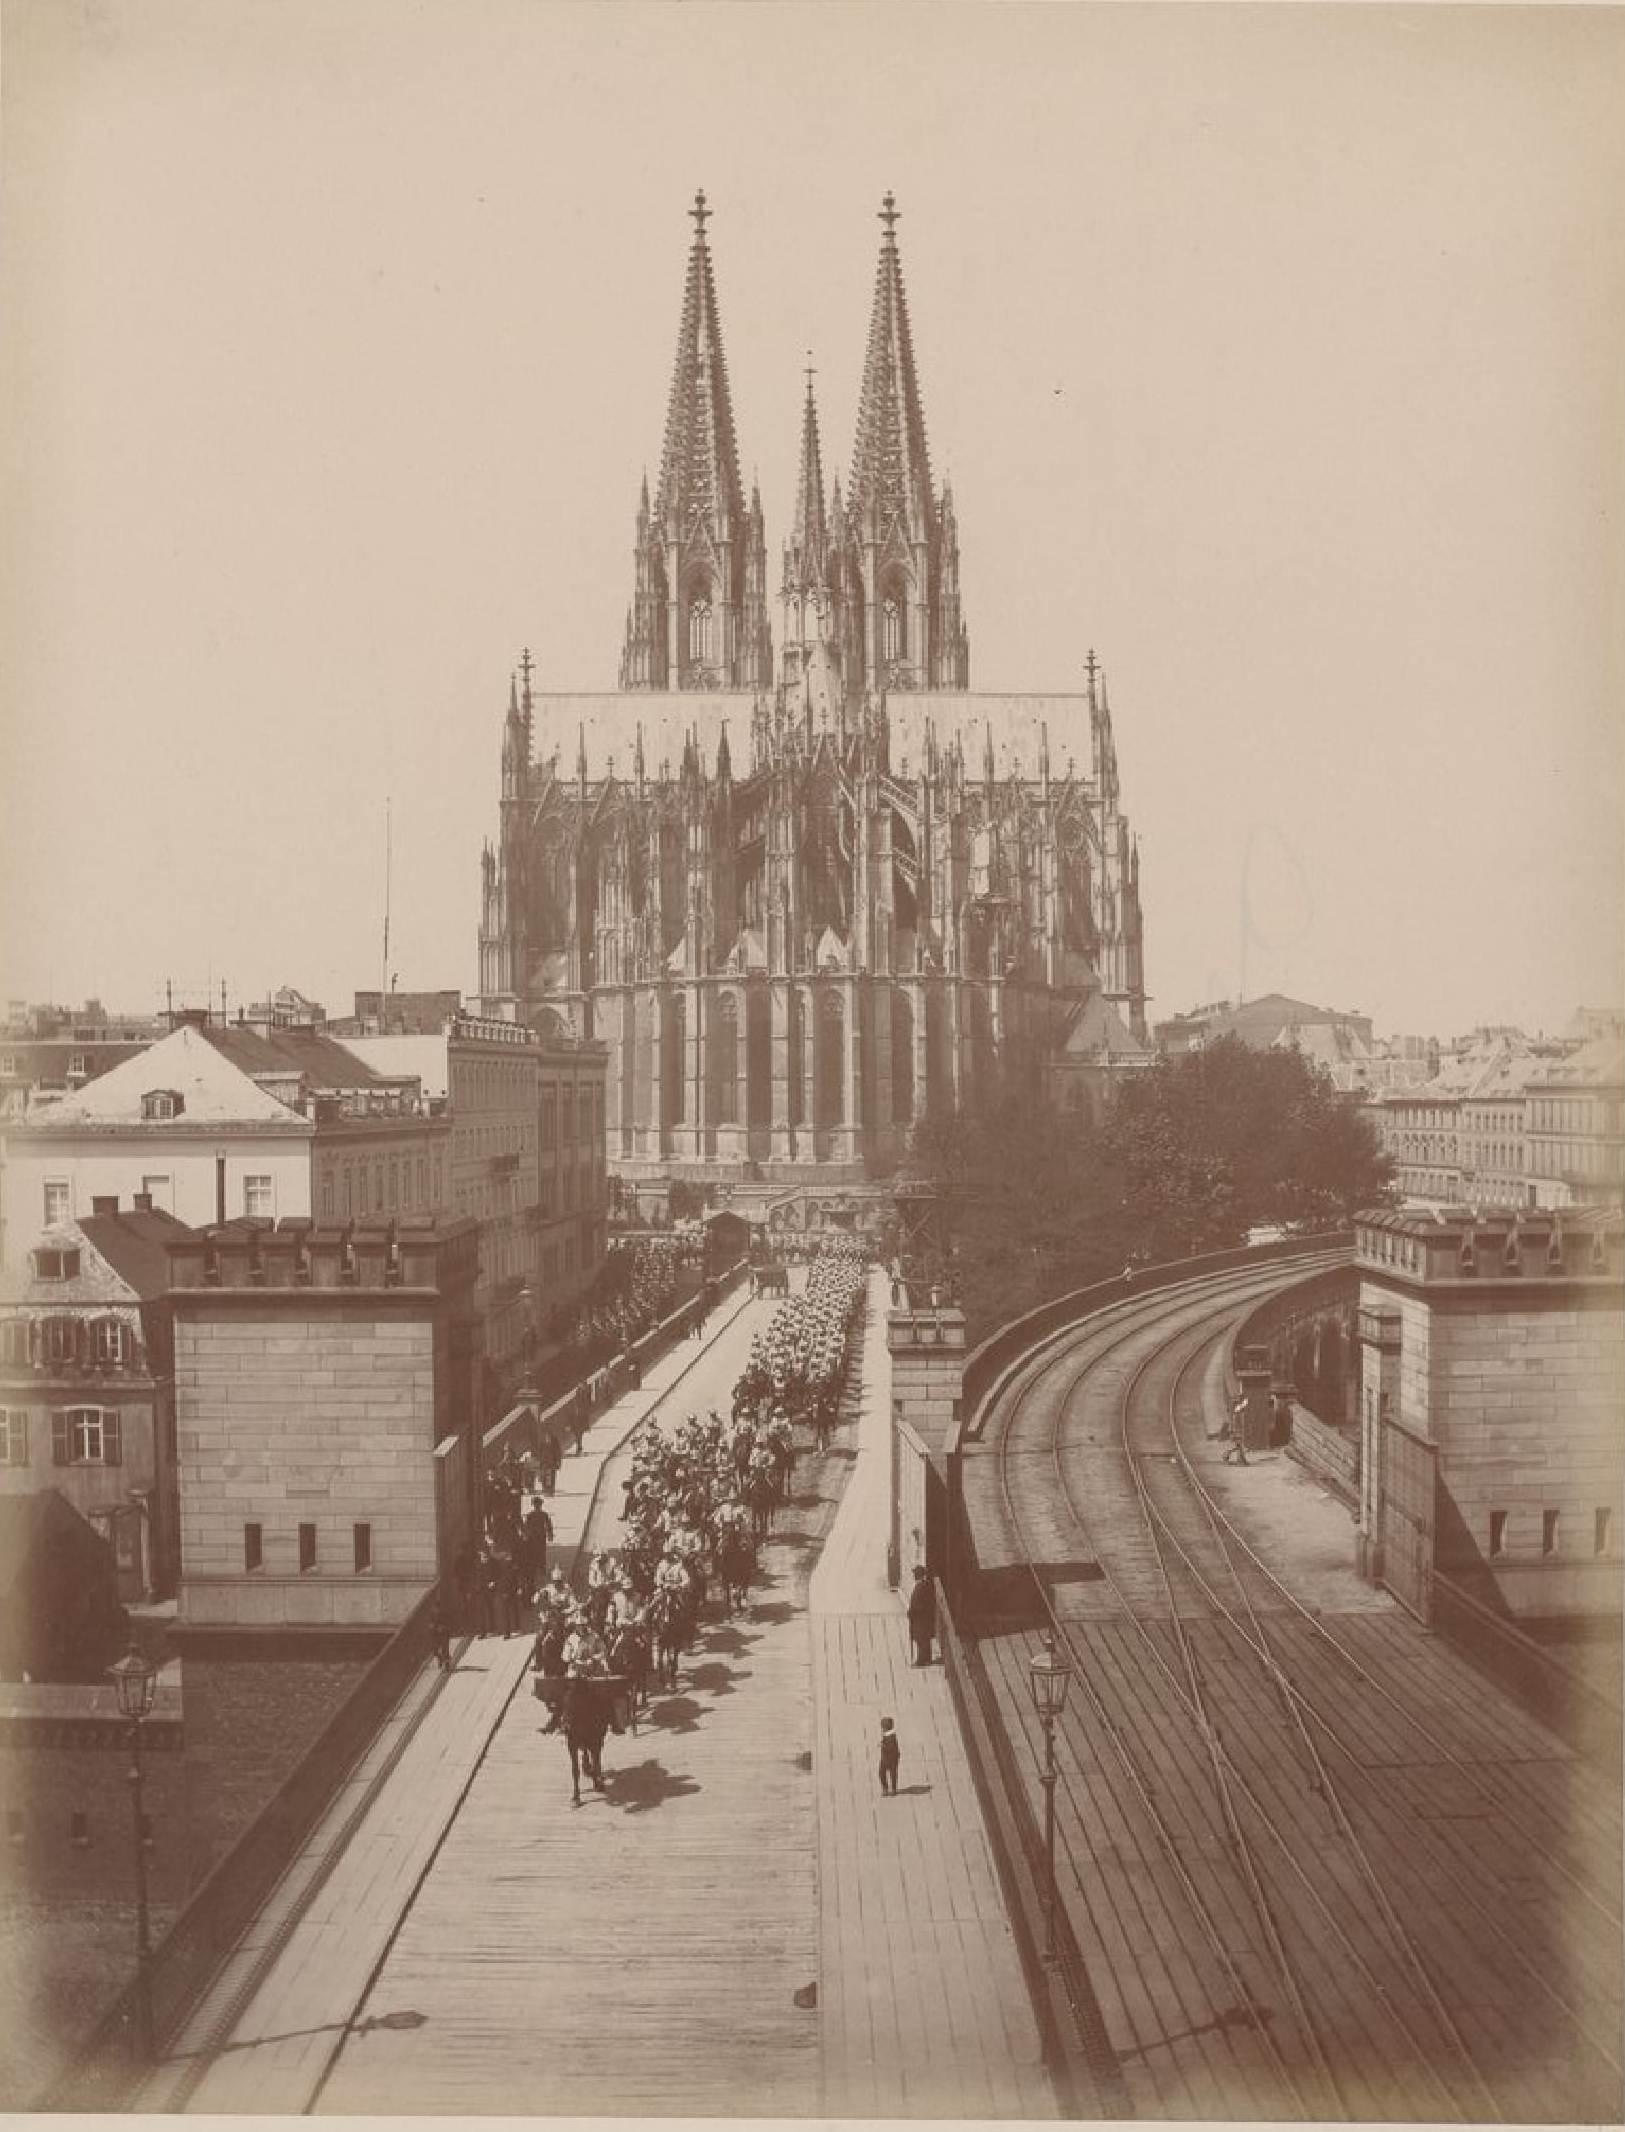 Германия. Кёльн. Мост и апсида собора, 18 мая 1888